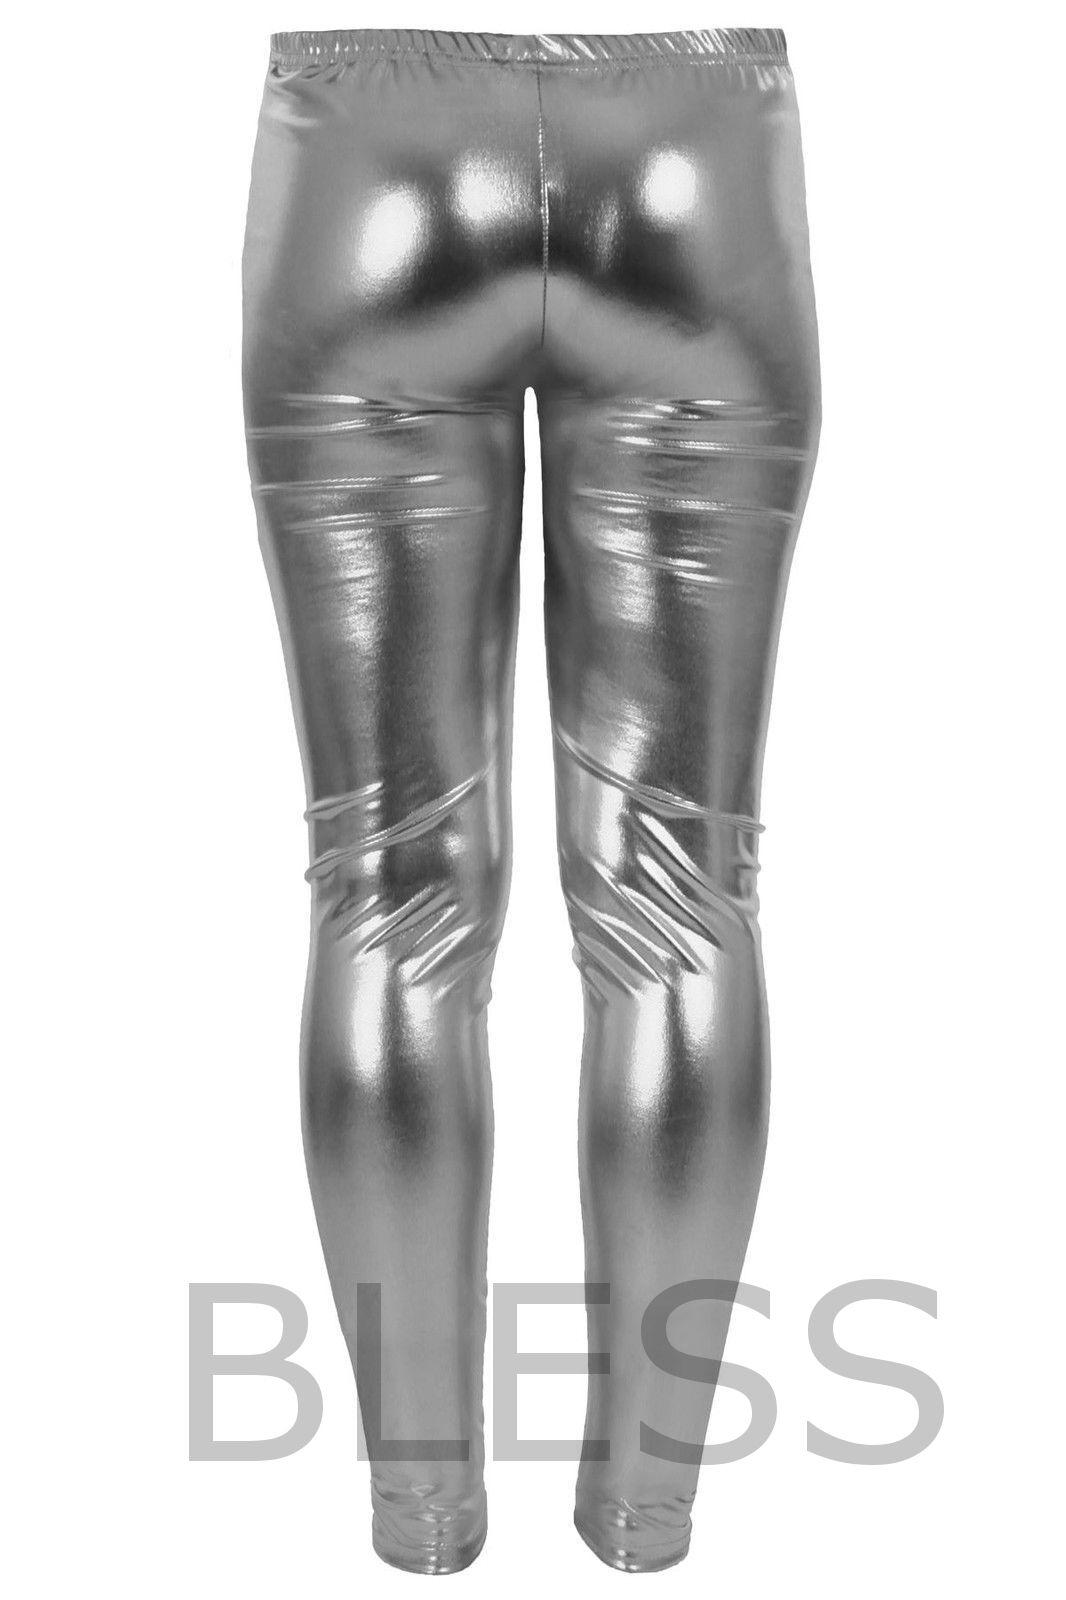 bd1ee23f02b0 WOMENS WET LOOK METALLIC LEGGINGS LADIES FOIL SHINY PLUS SIZE 16 18 20 22  24 26